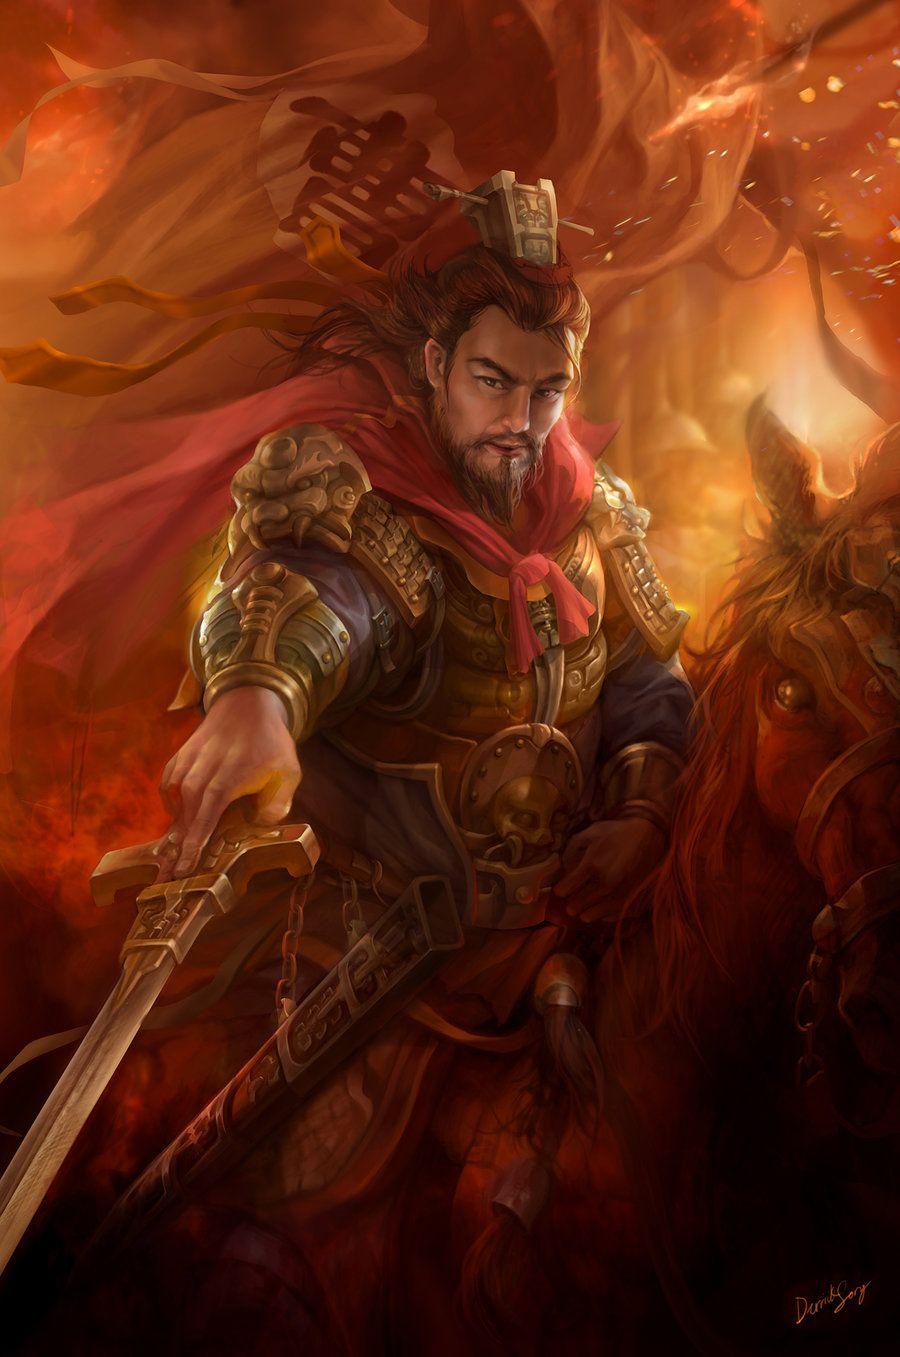 Dynasty Warrior Fanart - Caocao by derrickSong on deviantART